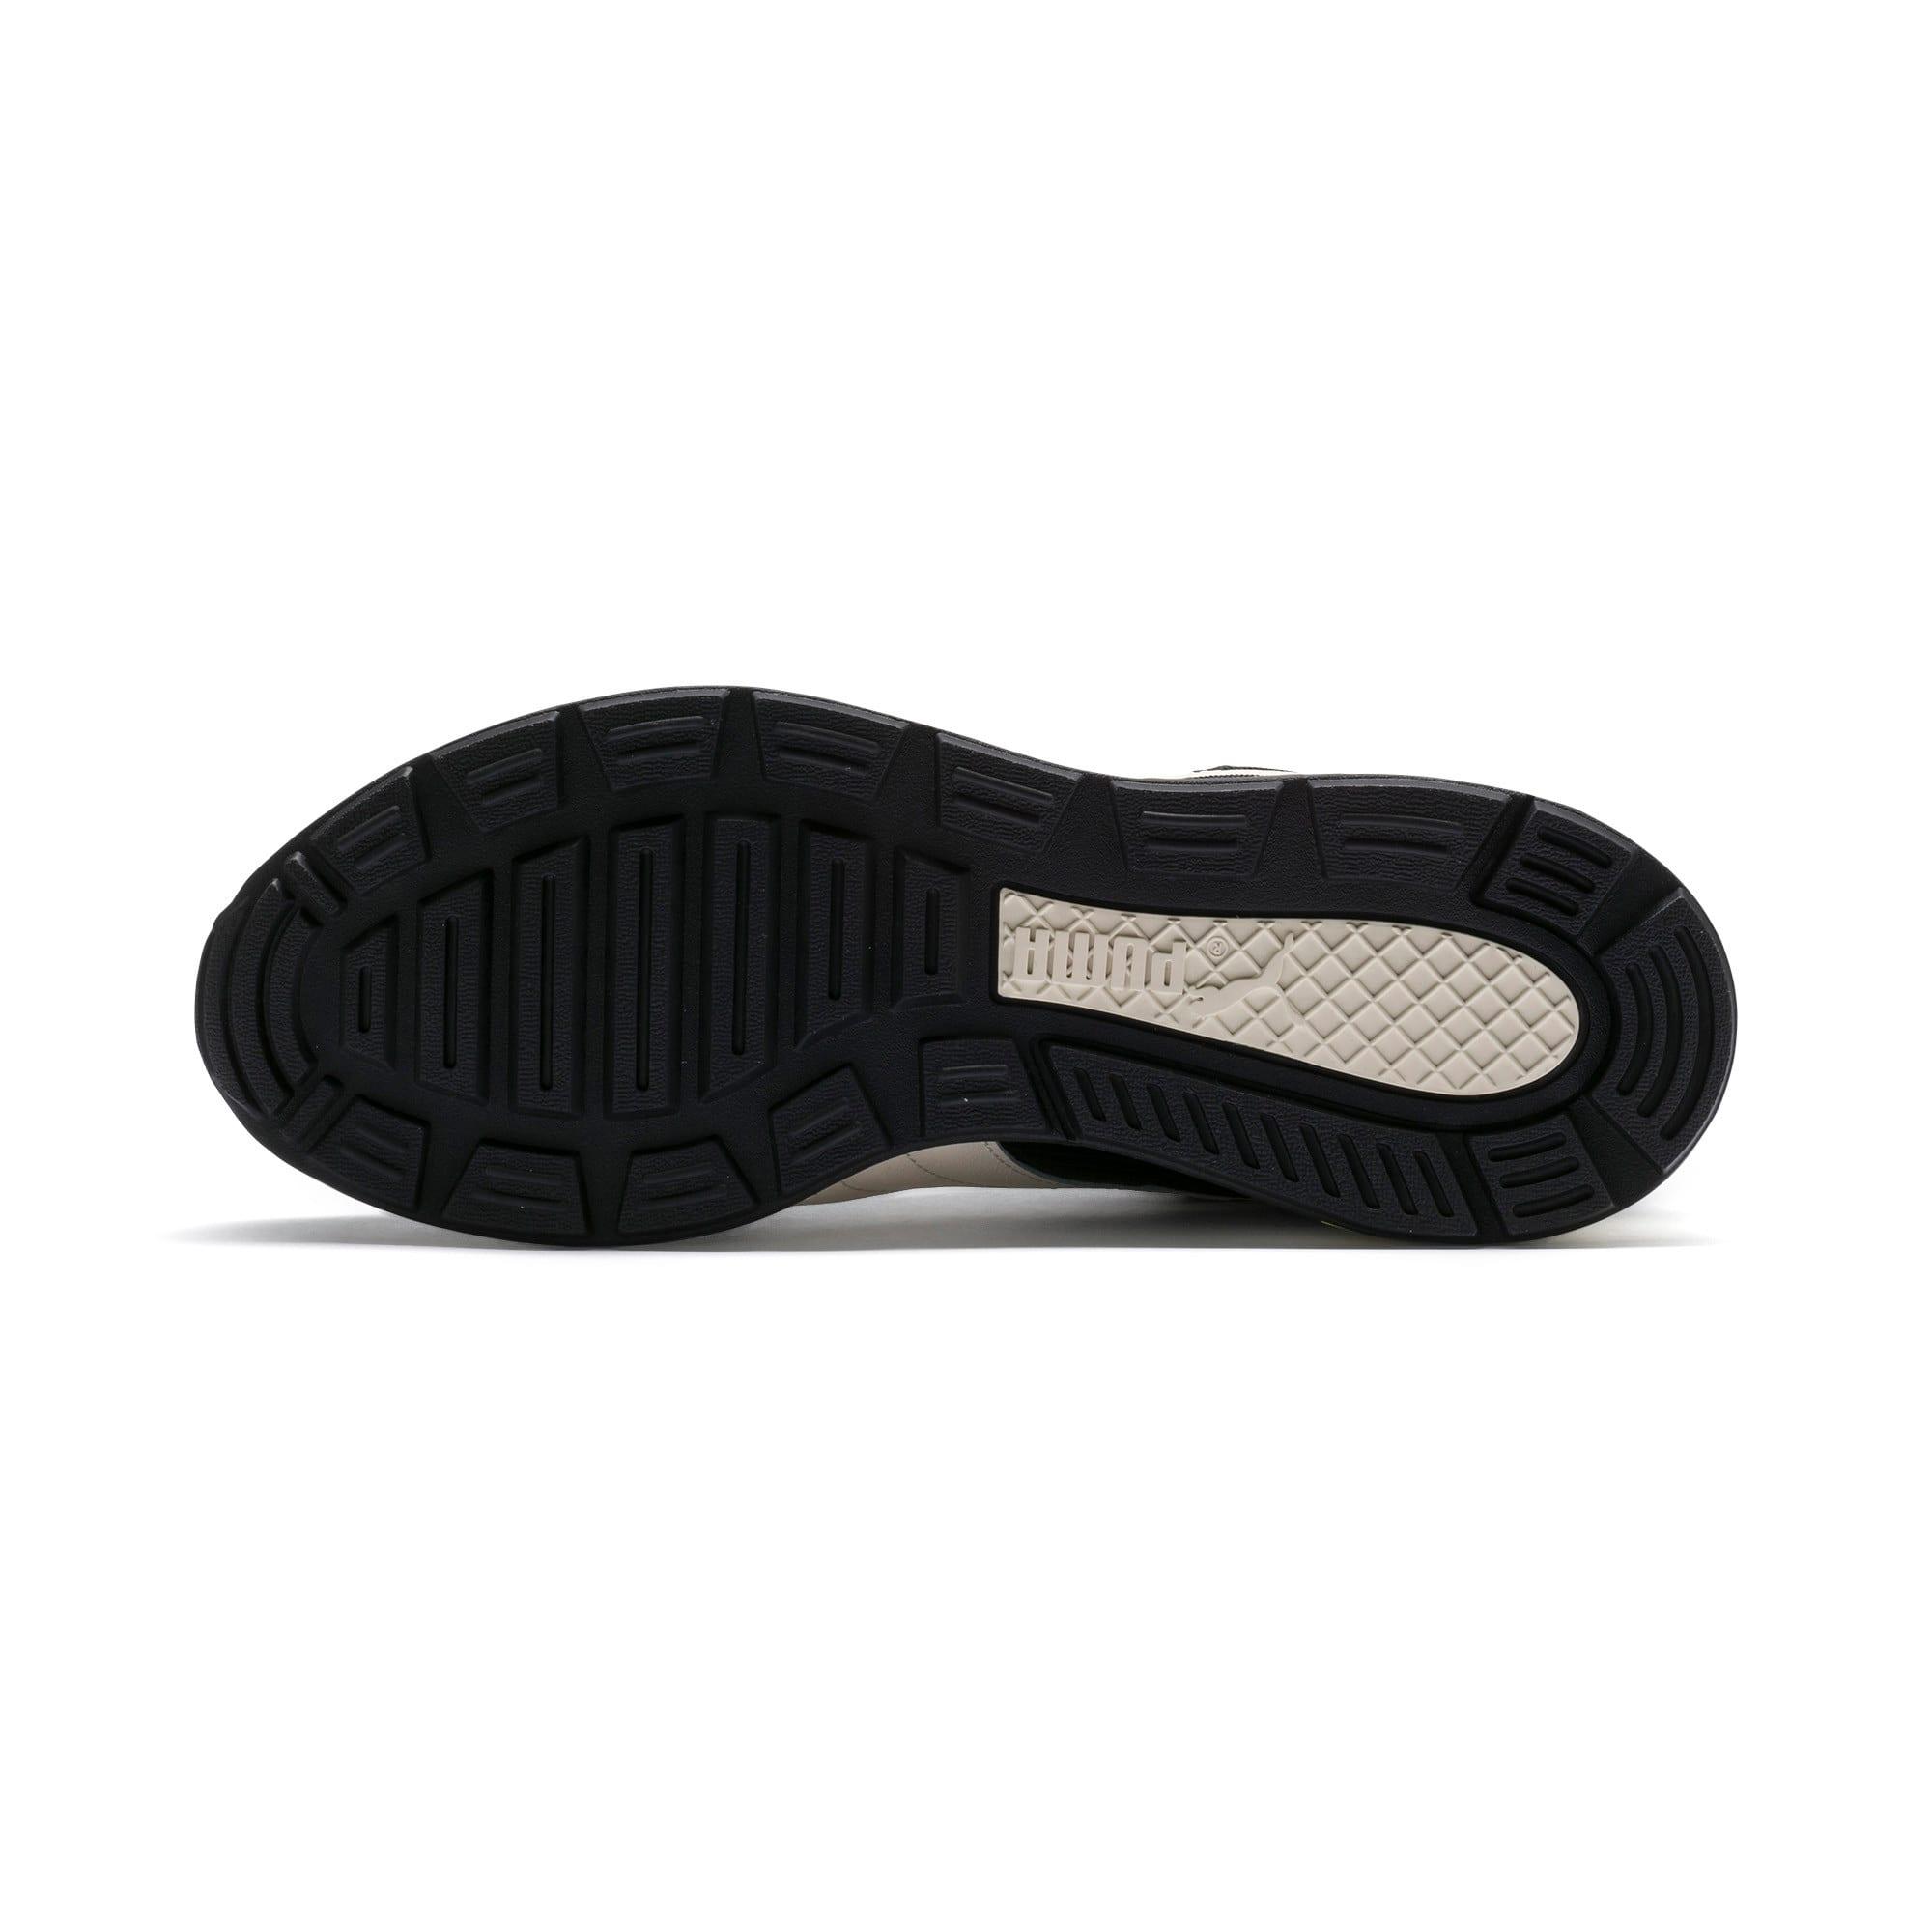 Thumbnail 5 of RS-350 OG Men's Sneakers, Puma Black-Ponderosa Pine, medium